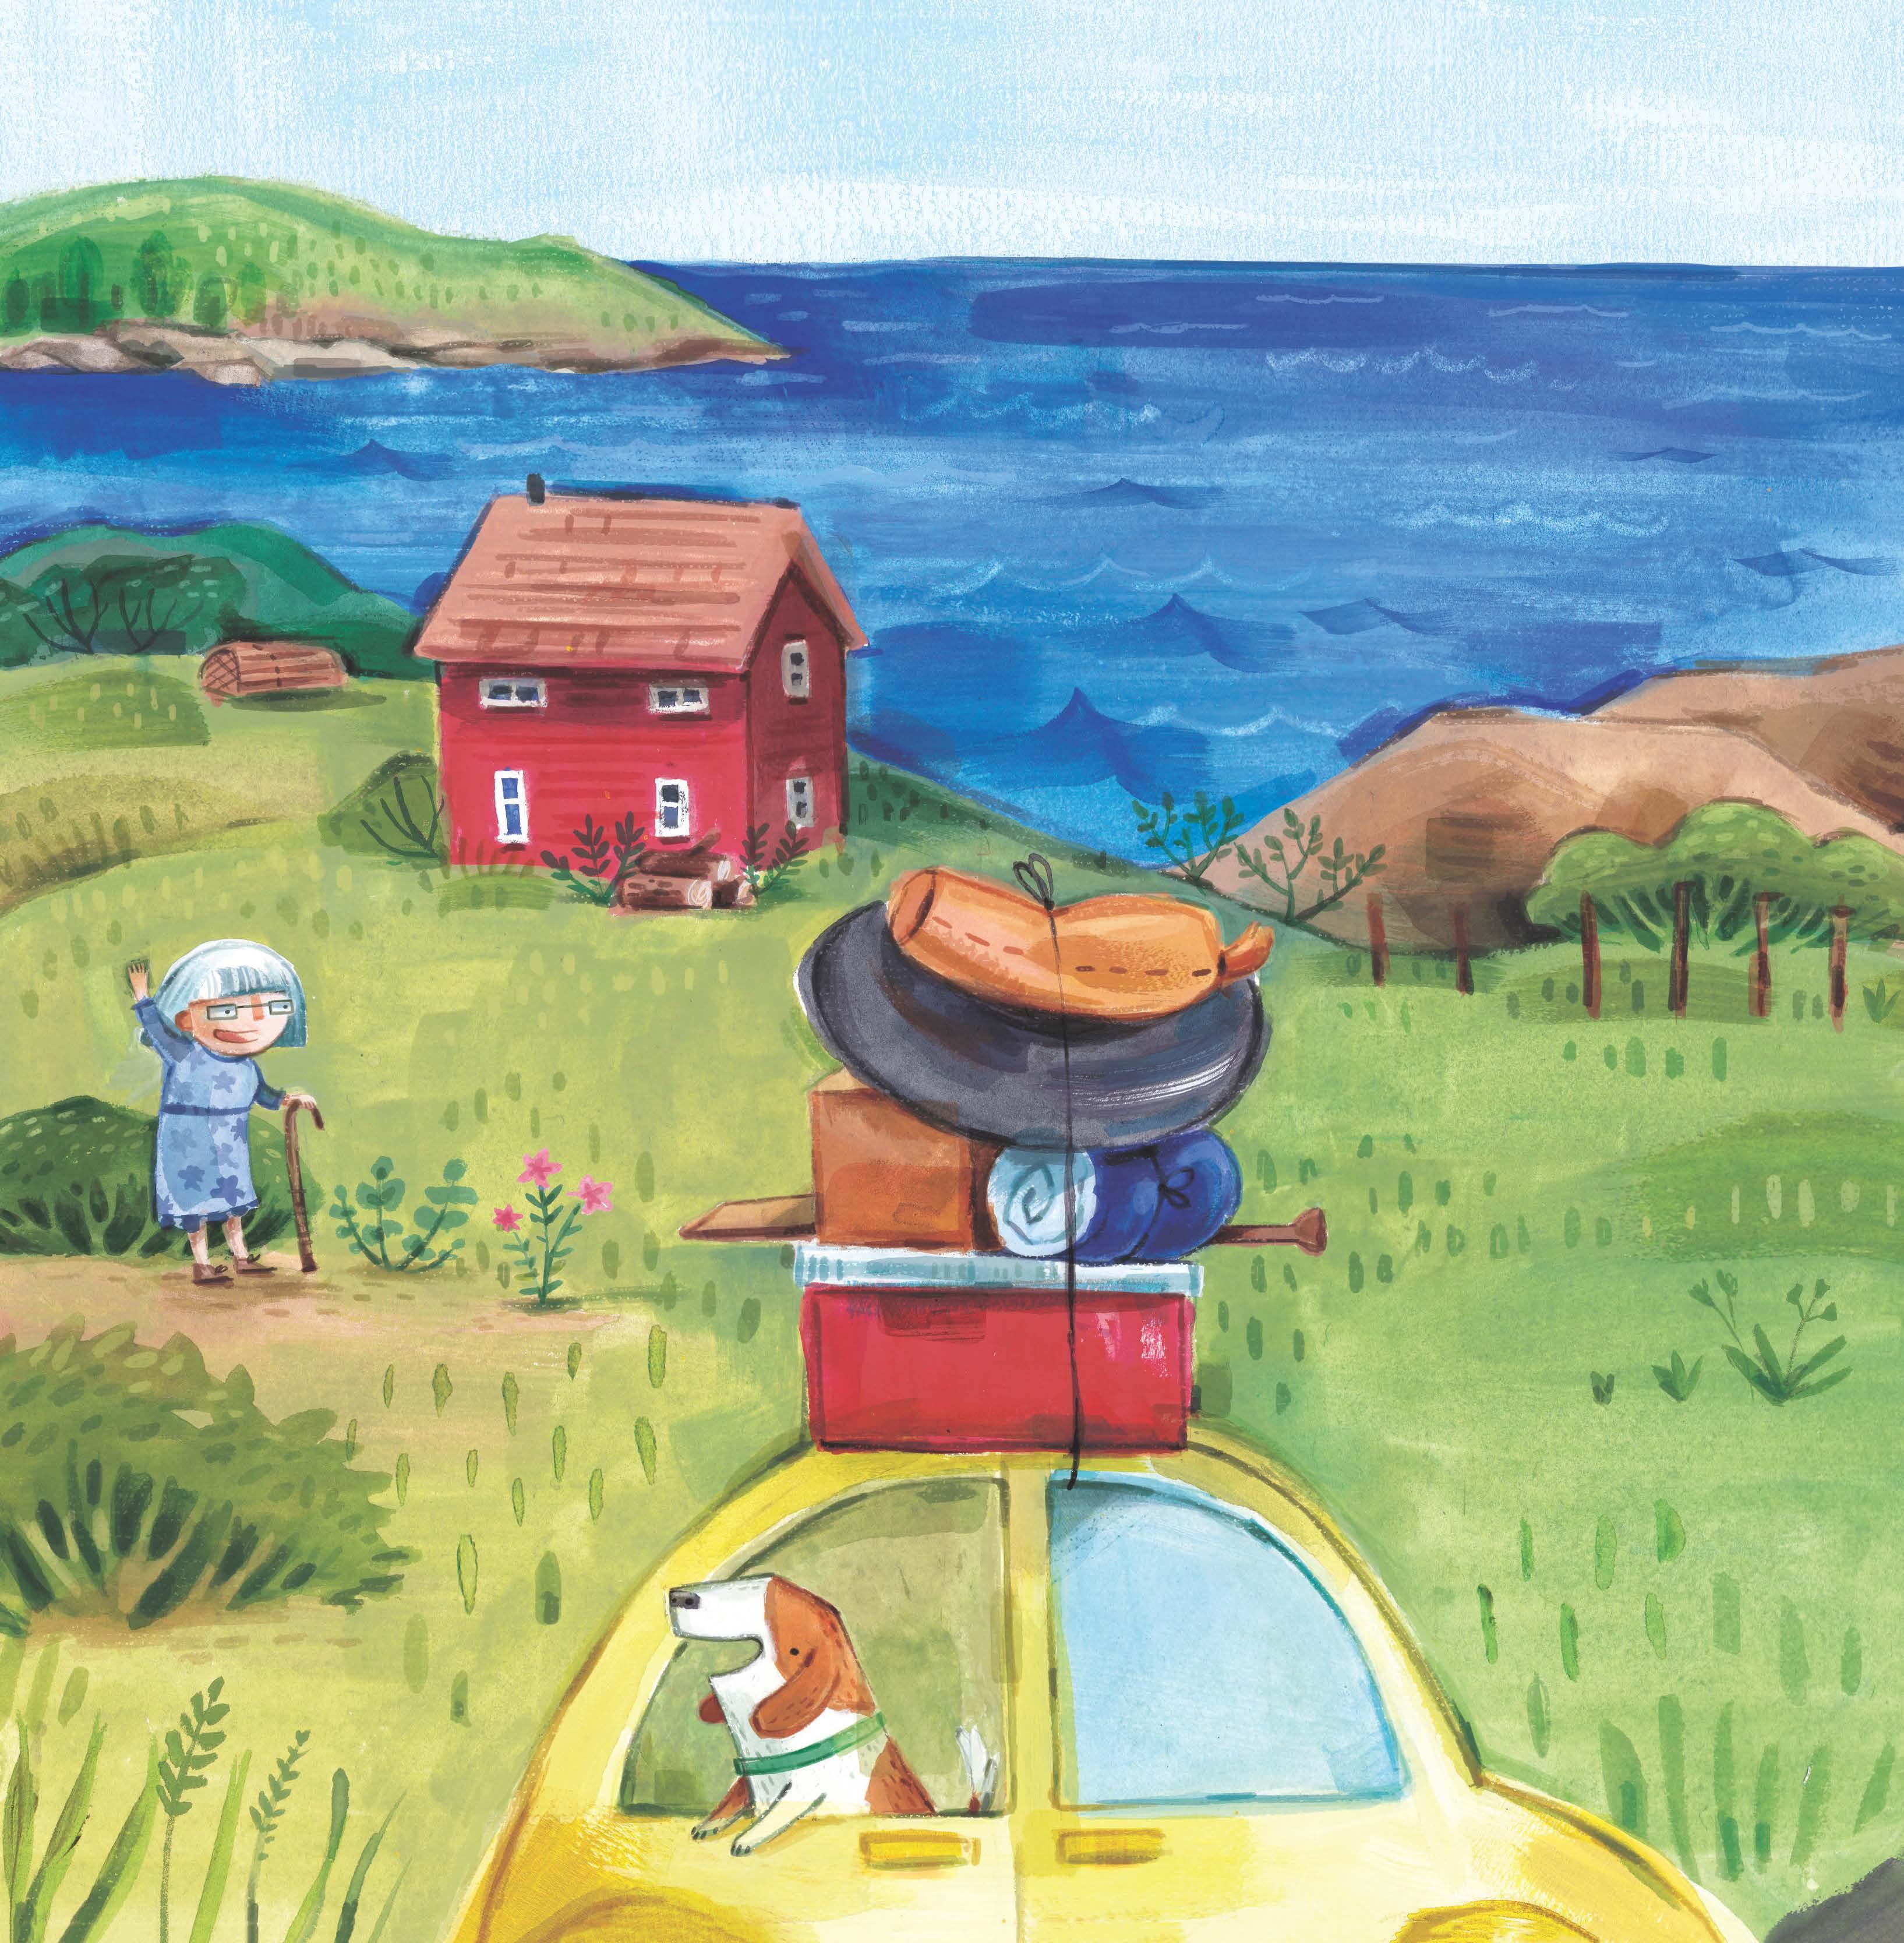 celebrate-picture-books-picture-book-review-carson-crosses-canada-elsie's-house